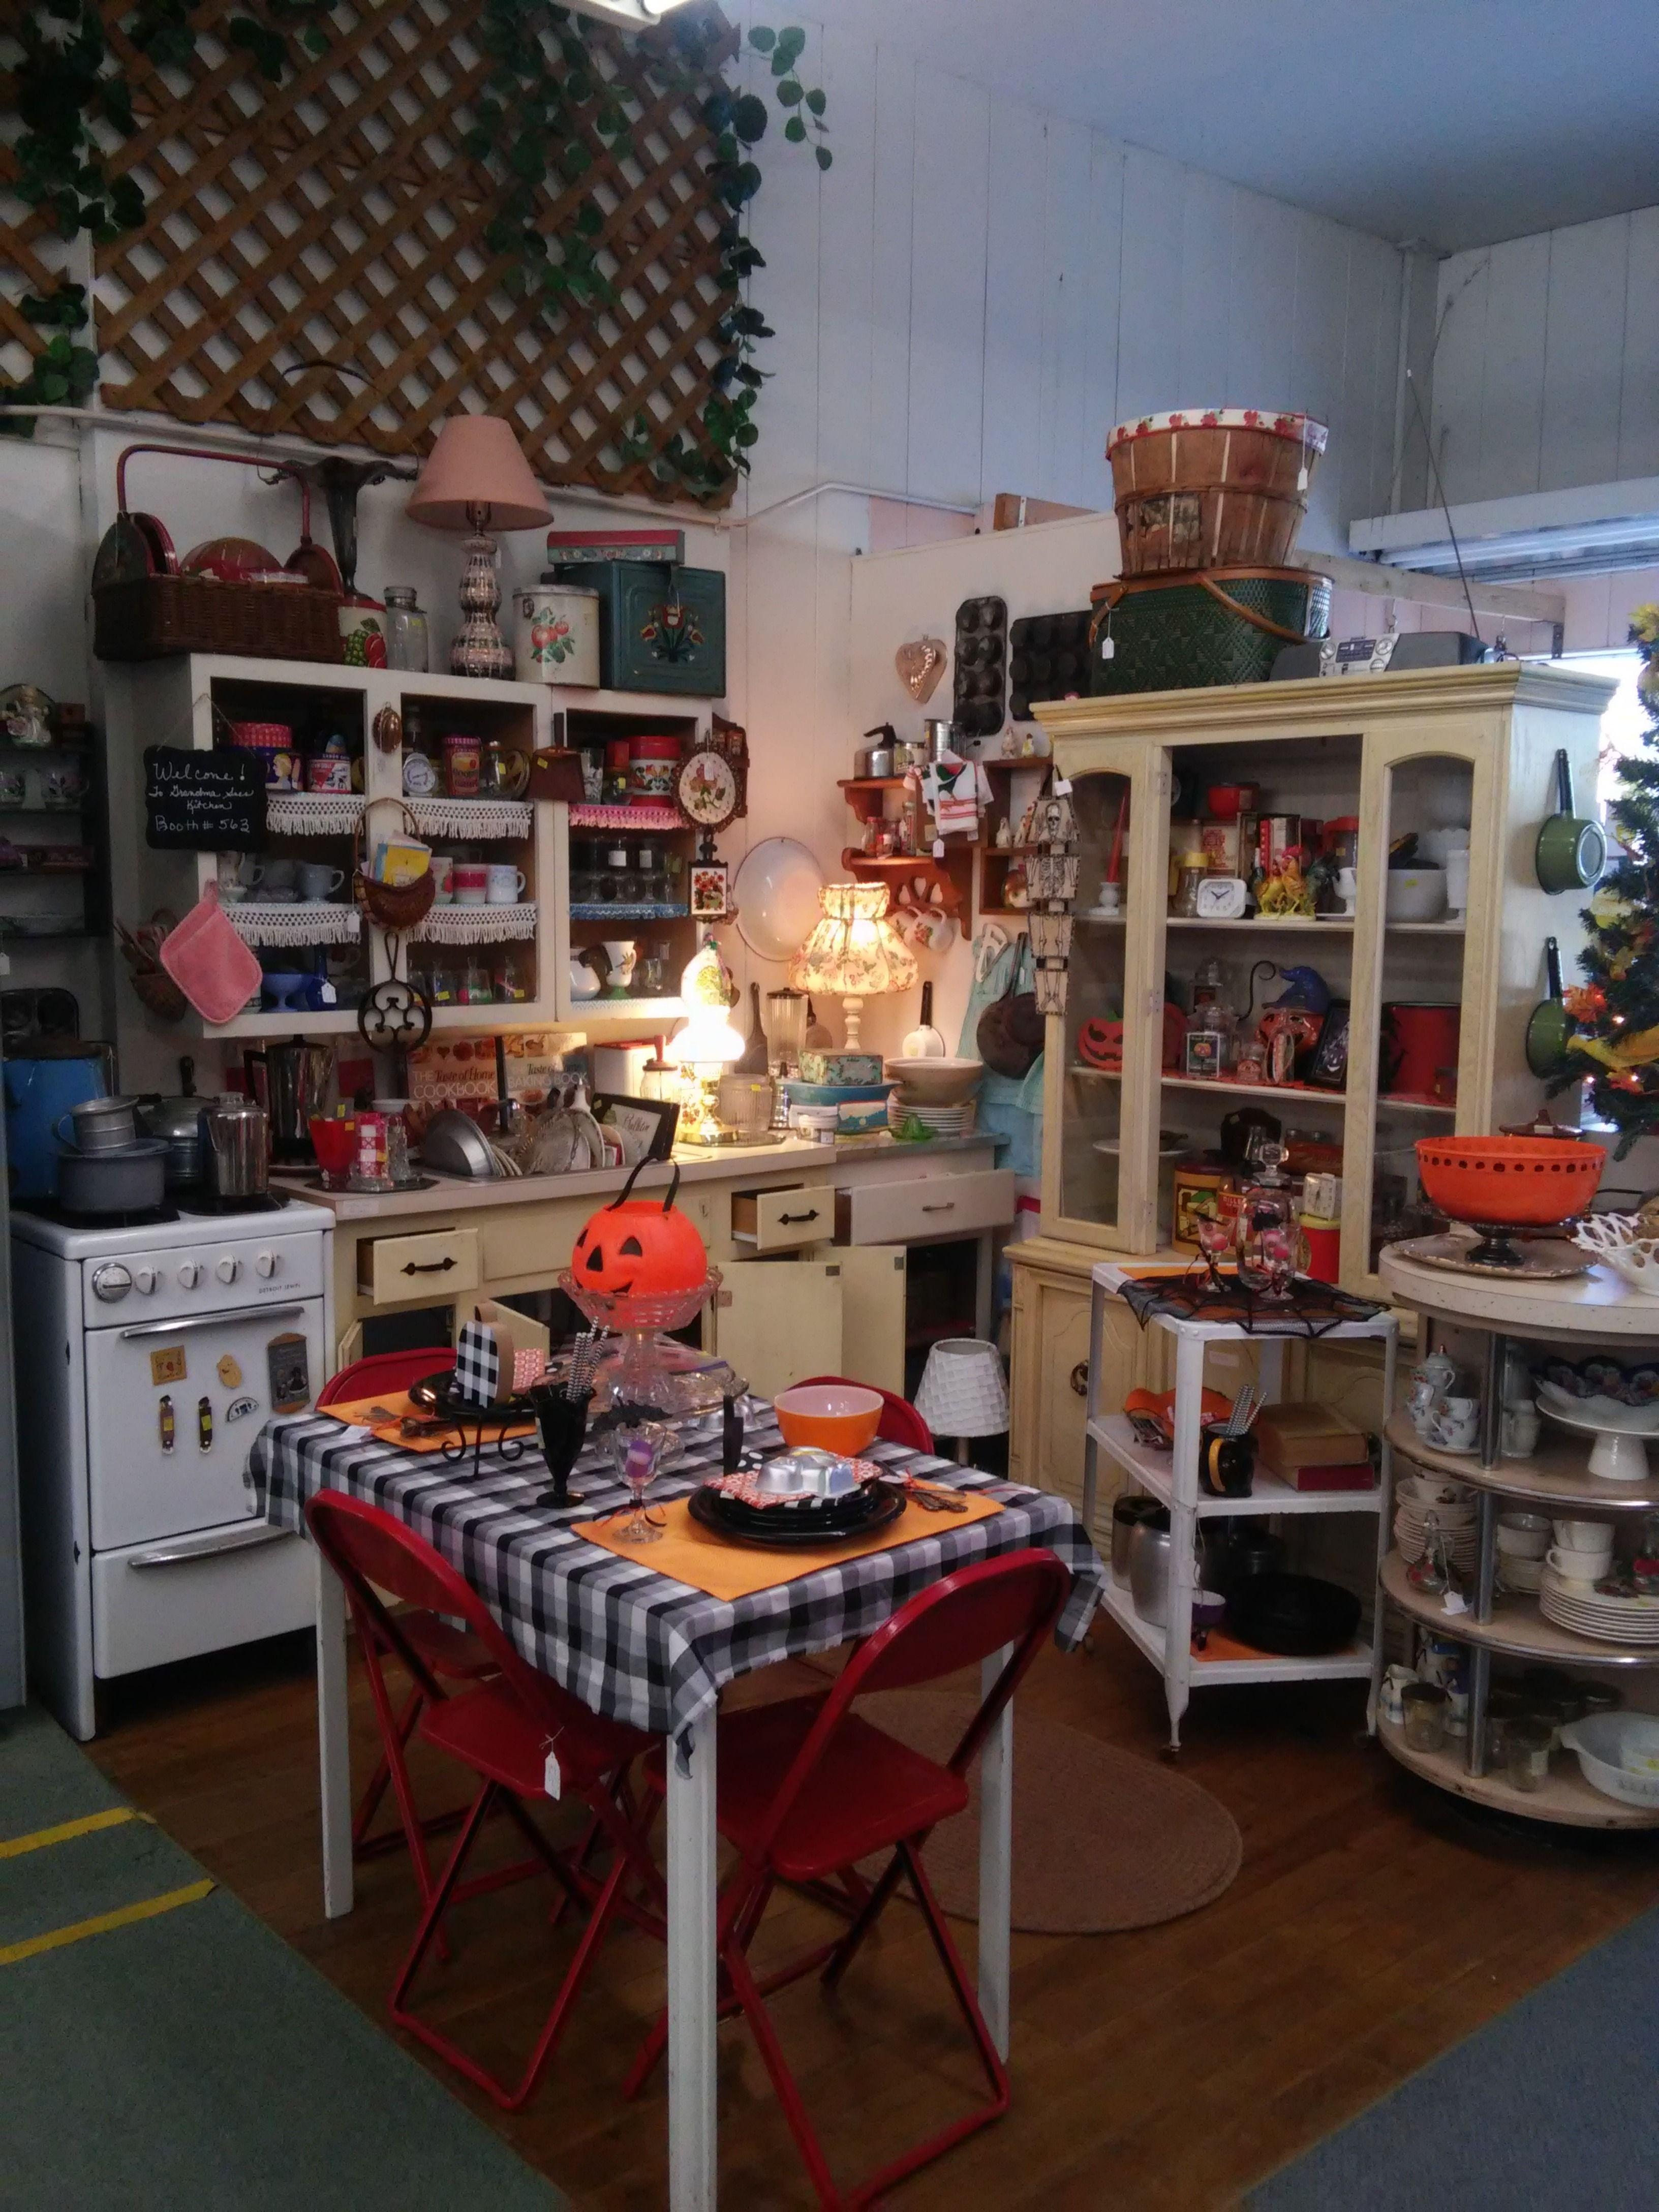 Pin By Grandma Sues Kitchen On Grandma Sues Kitchen Bay Antique